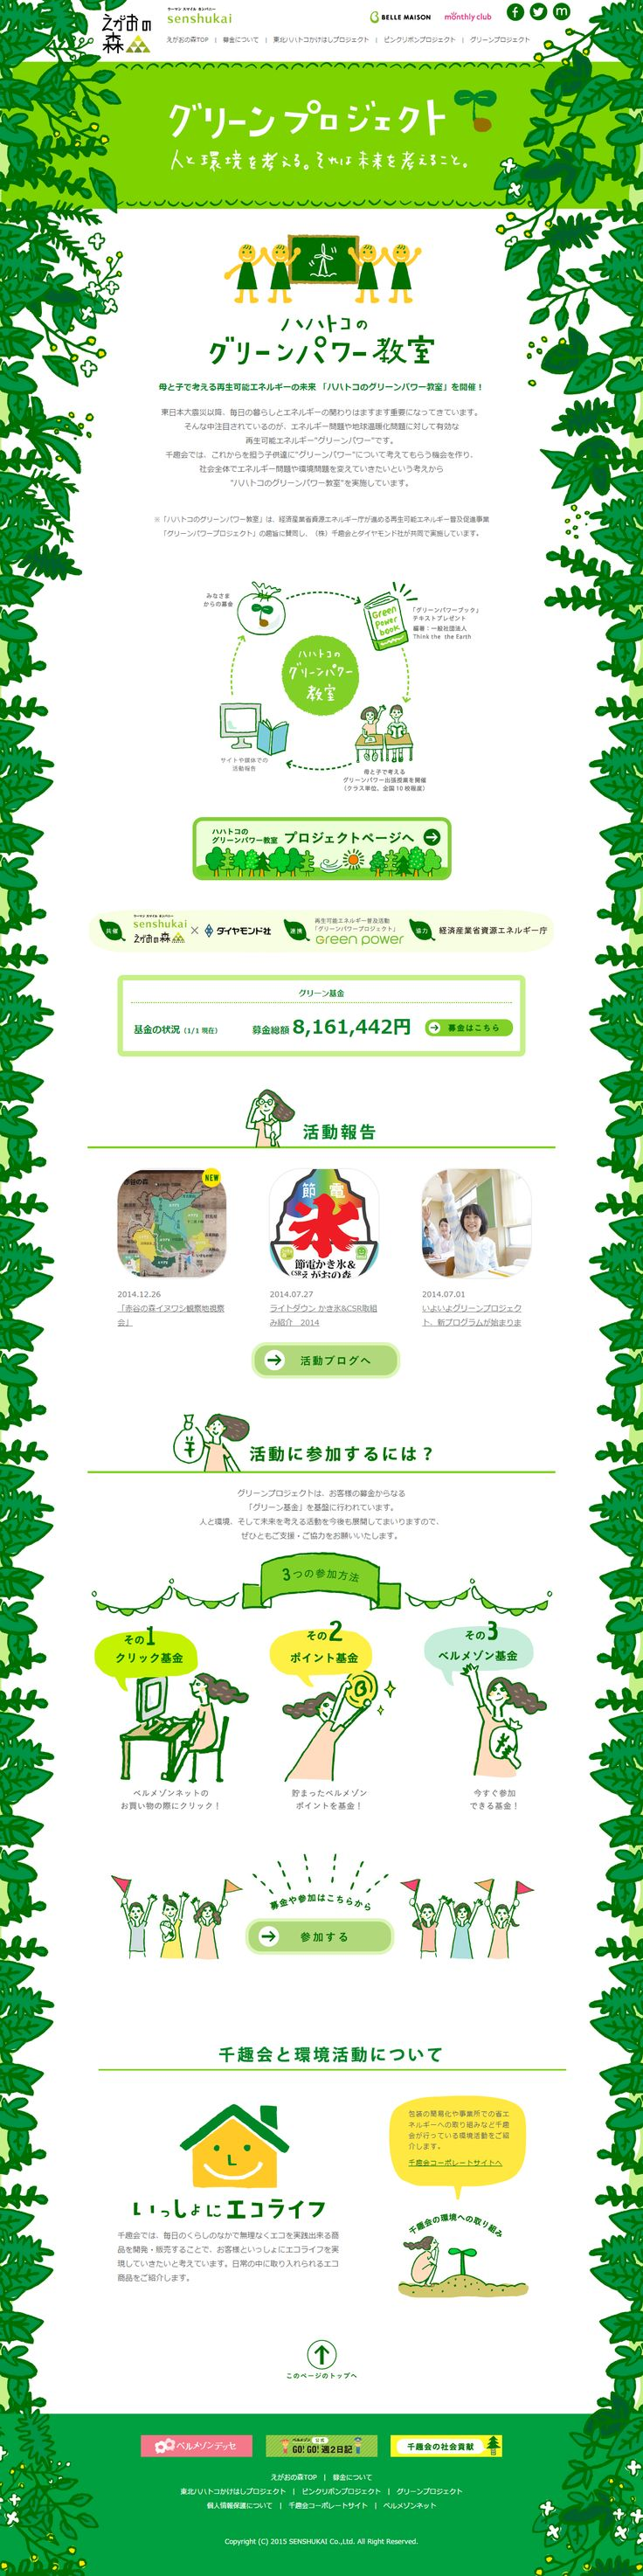 http://www.egaono-mori.jp/green/index.html